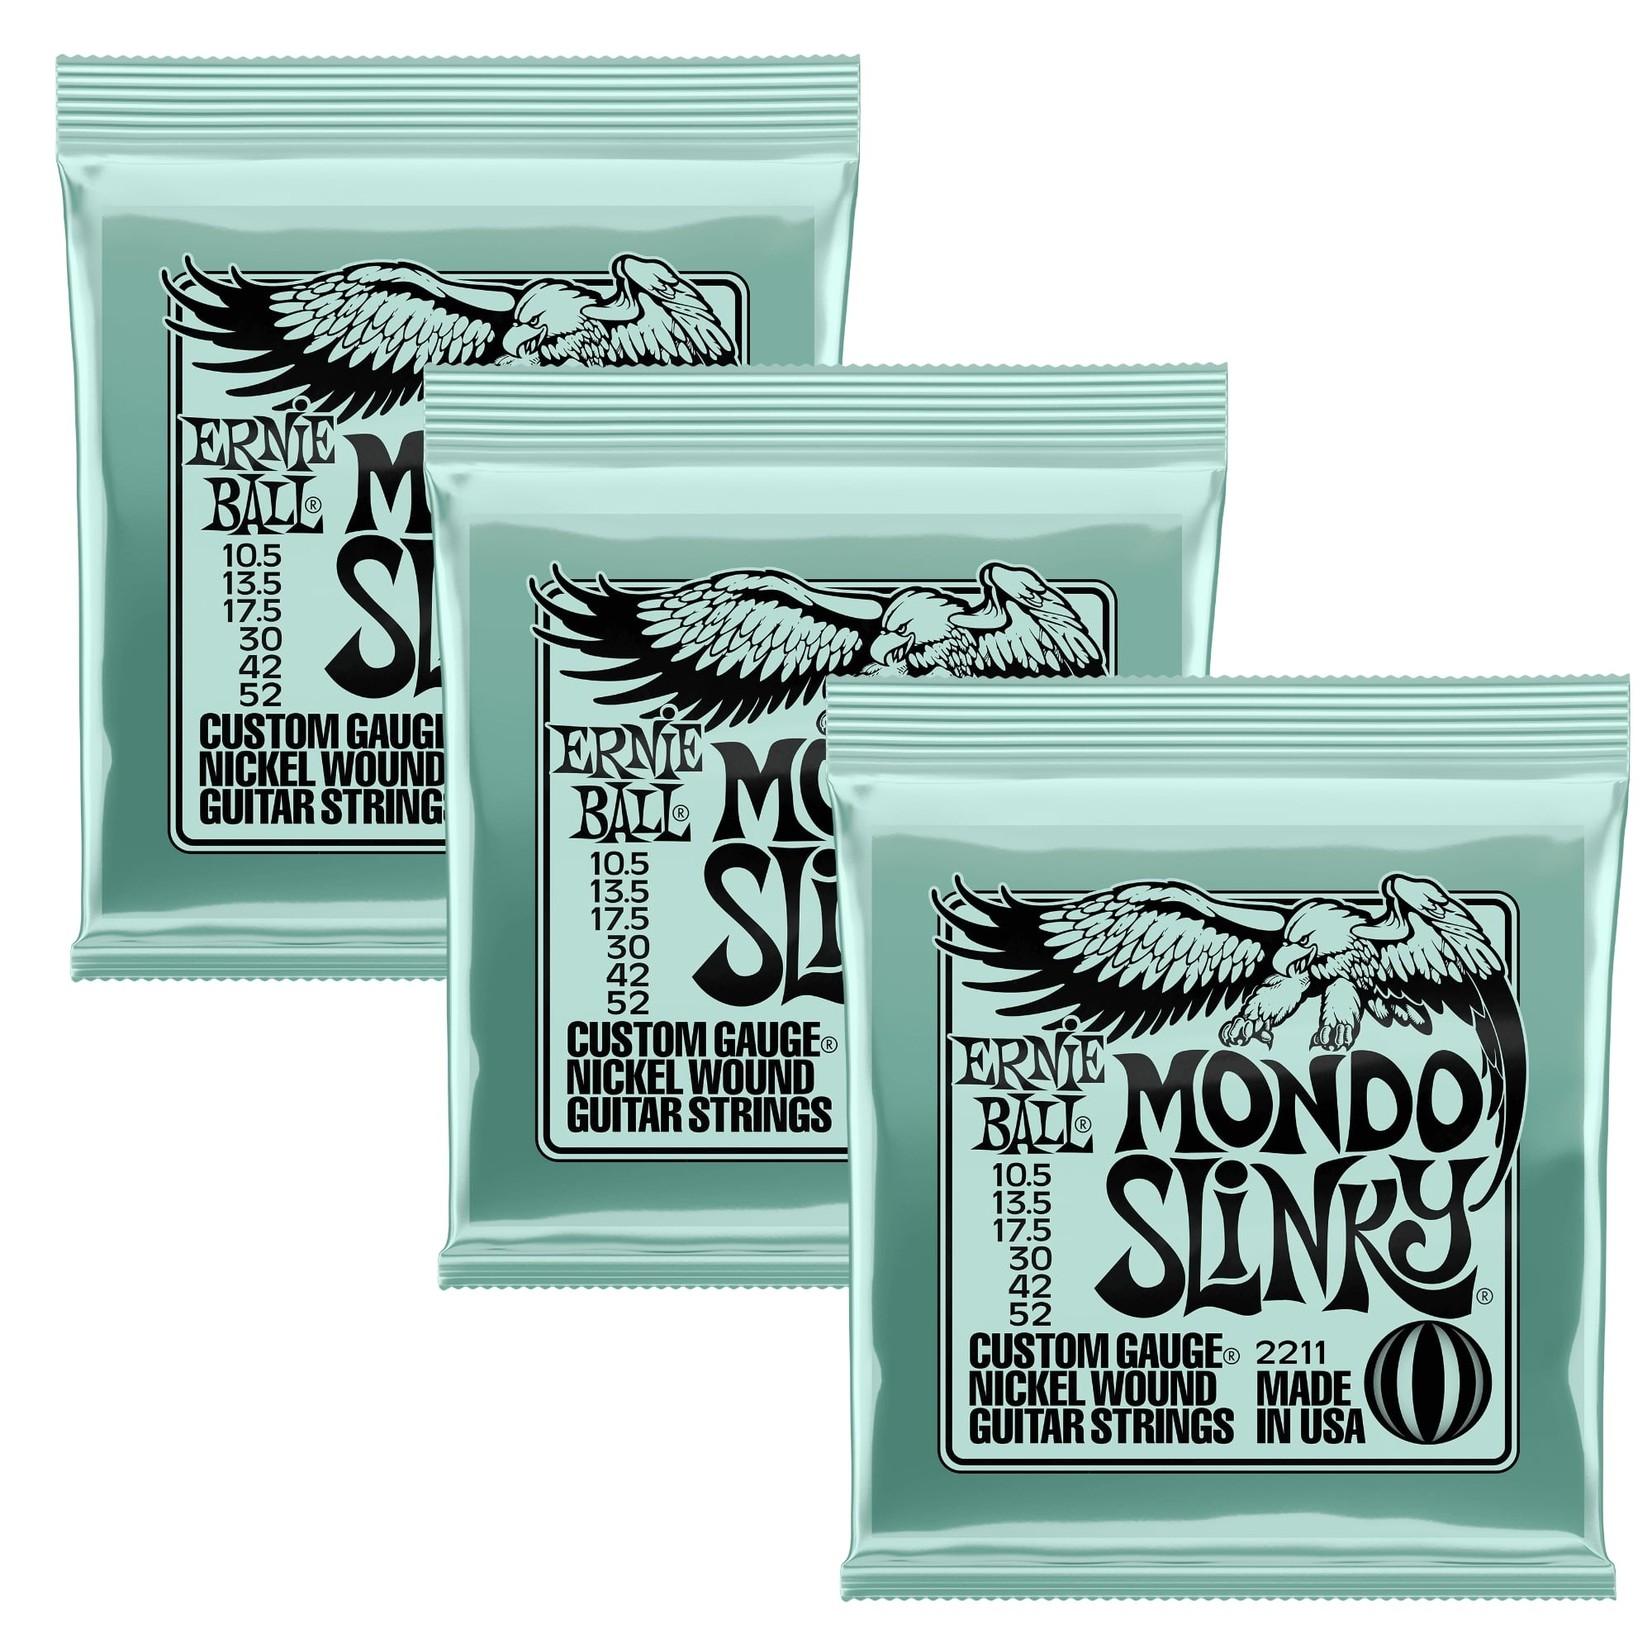 Ernie Ball 3x (3 sets) Ernie Ball Mondo Slinky Custom Gauge Nickel Wound Guitar Strings (10.5-52), 2211